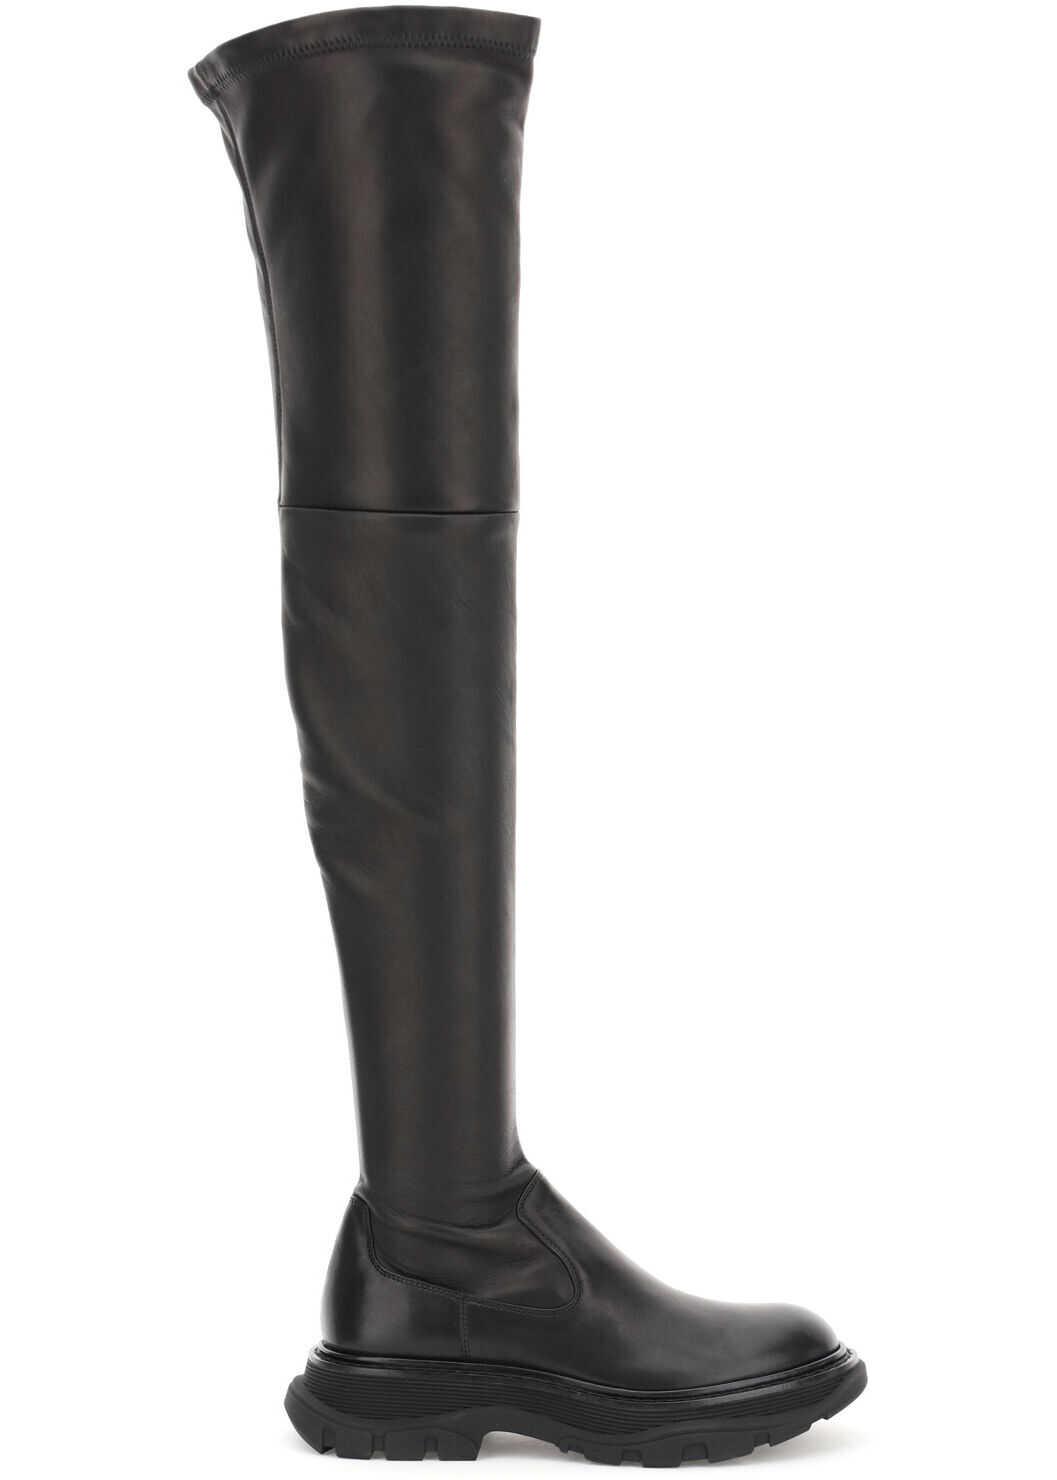 Alexander McQueen Tread Cuissard Boots 641850 WHSS2 BLACK imagine b-mall.ro